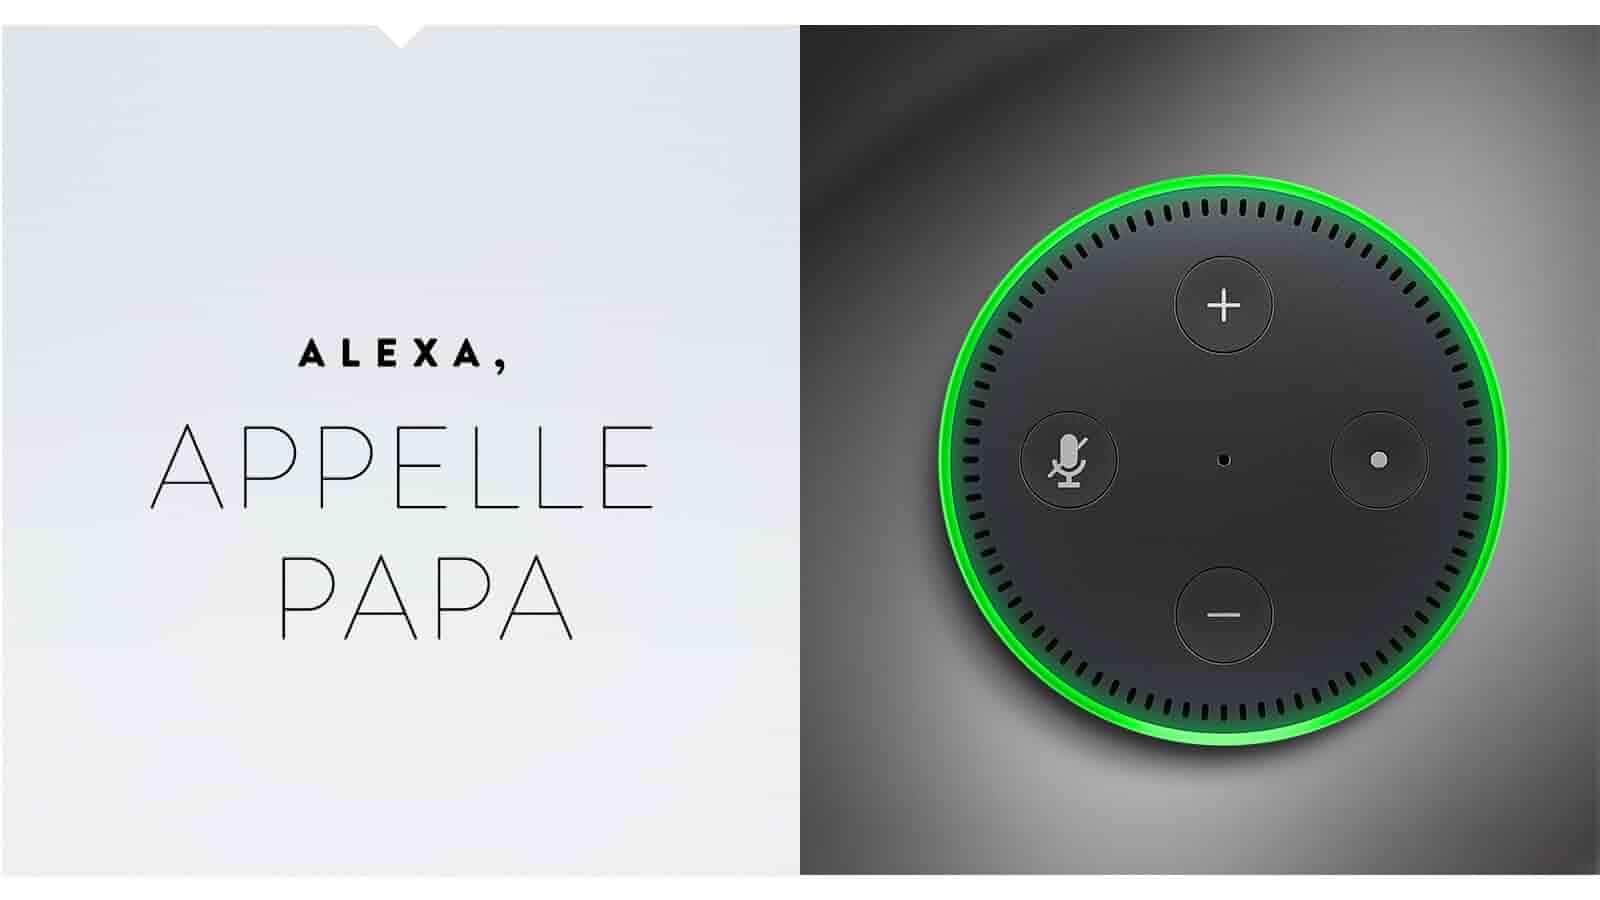 Alexa, appelle papa.